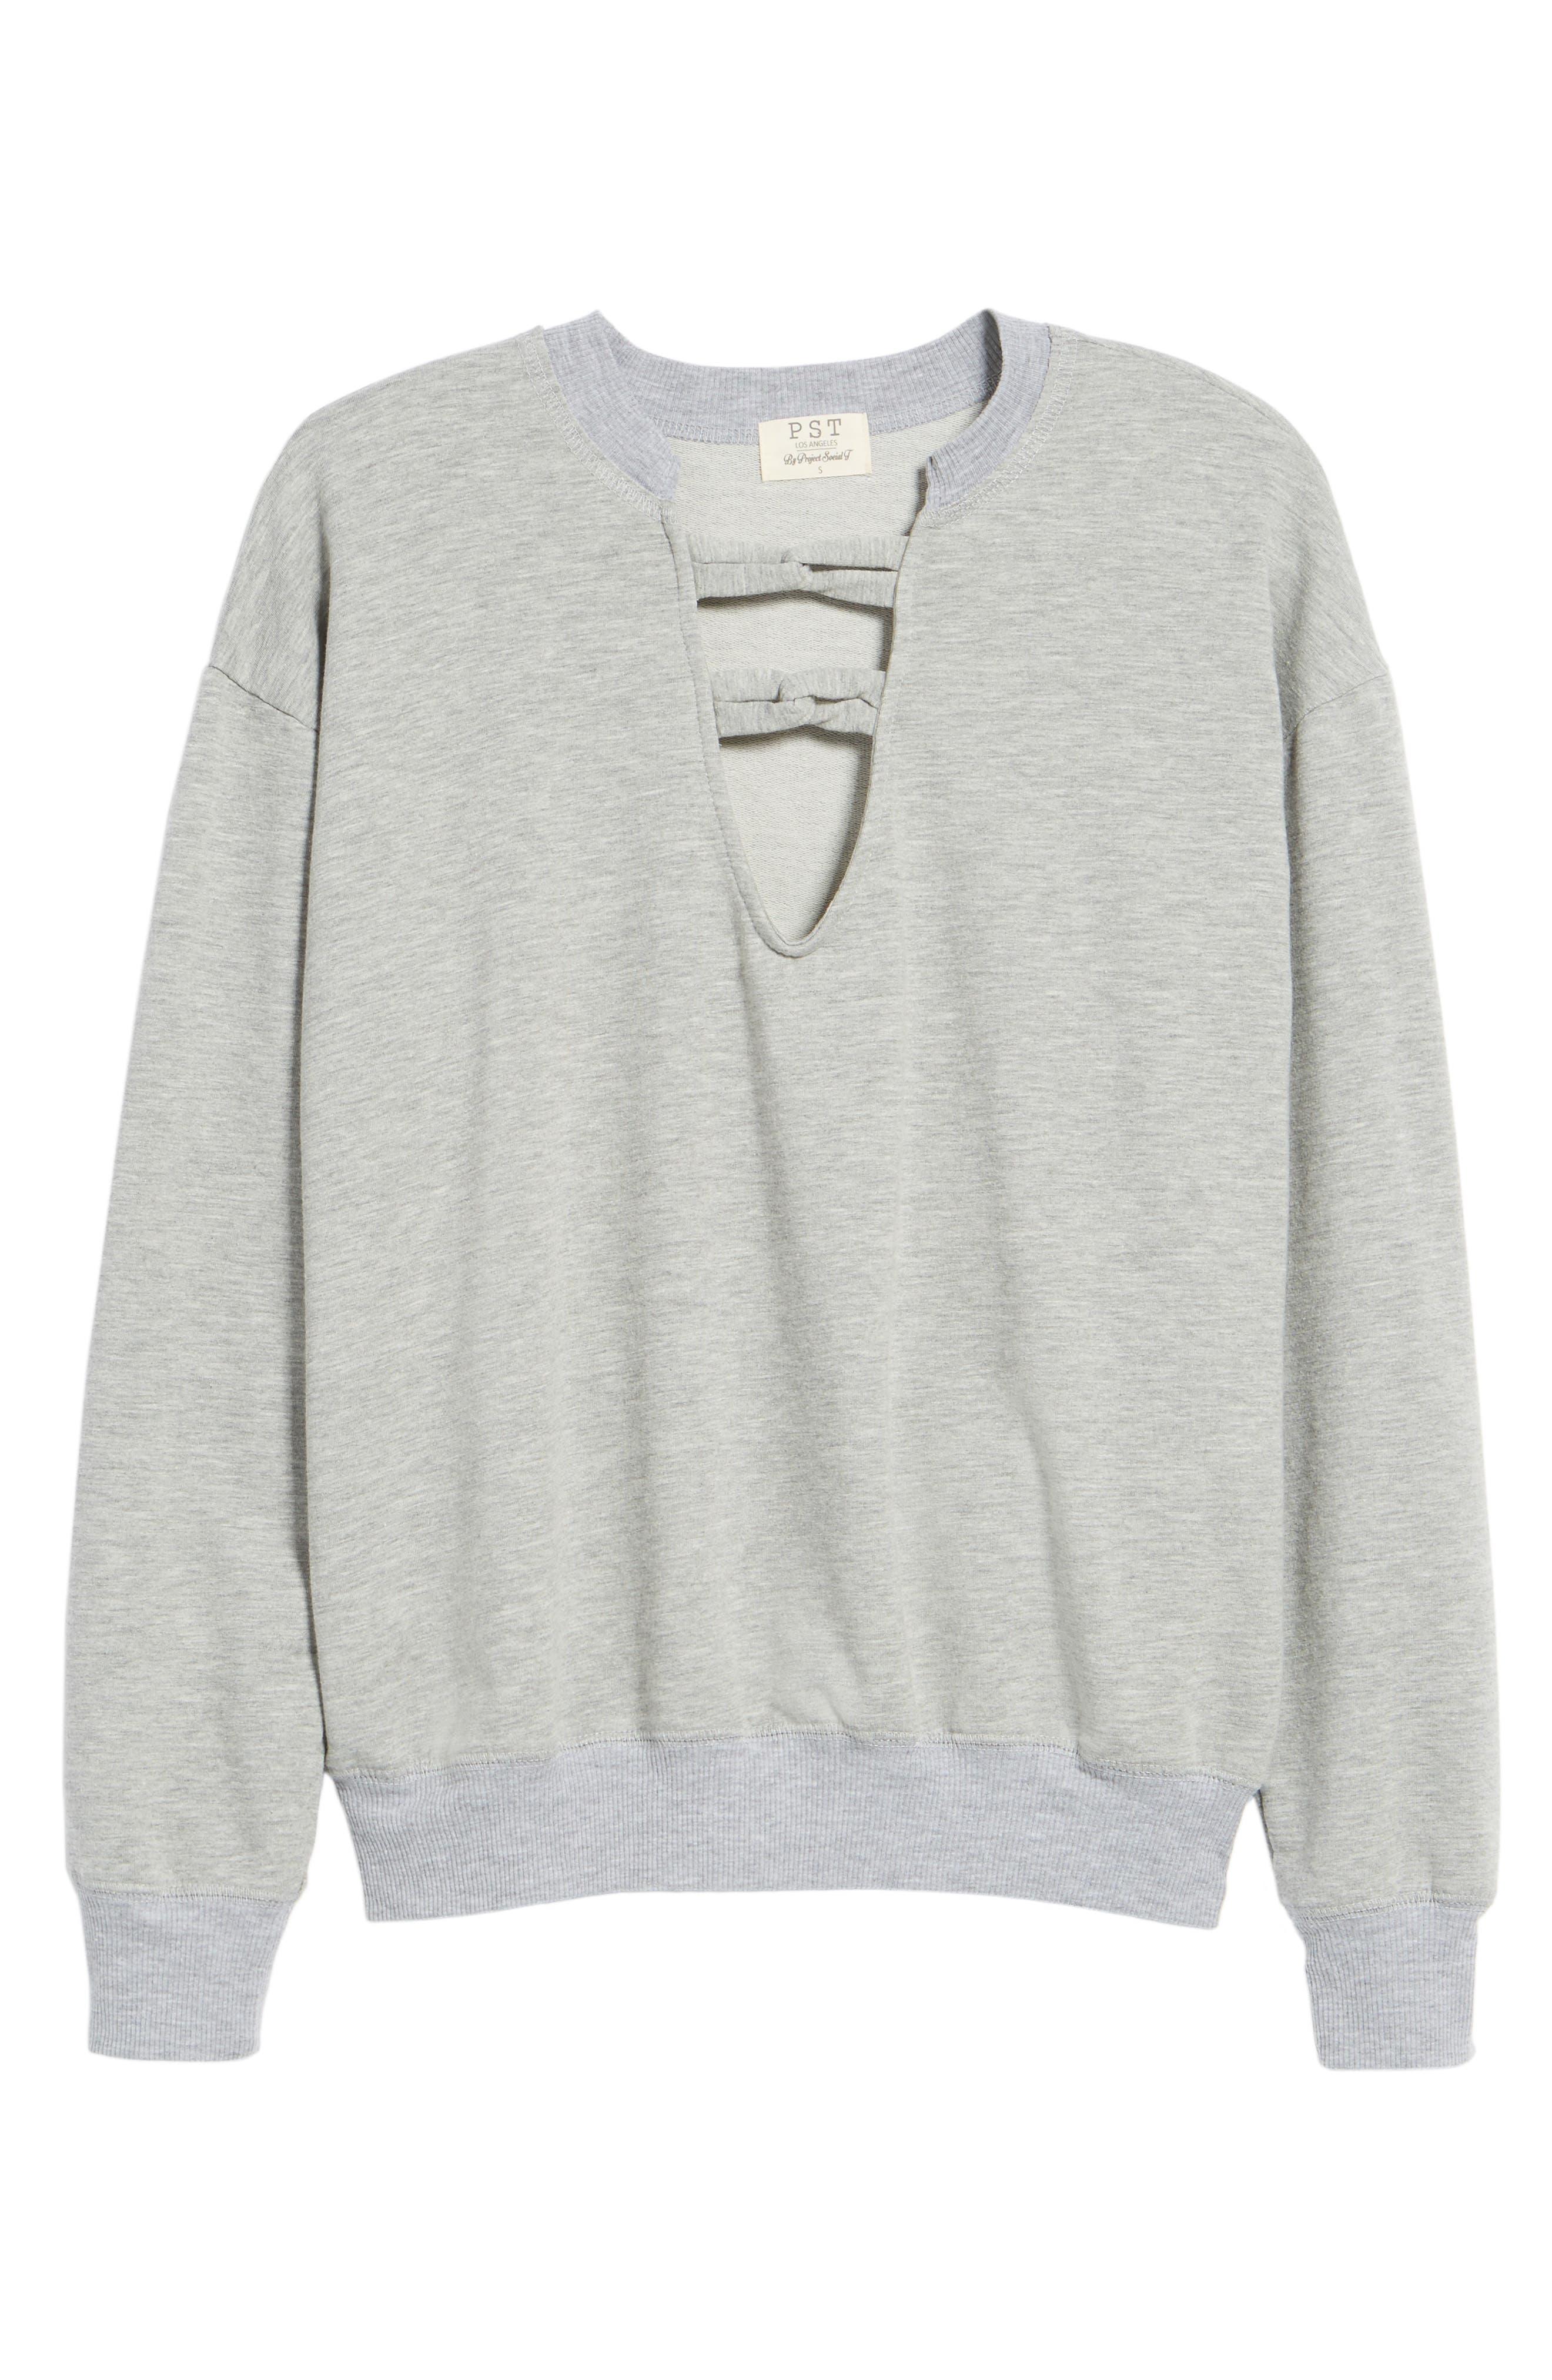 Infinity Knot Sweatshirt,                             Alternate thumbnail 6, color,                             052